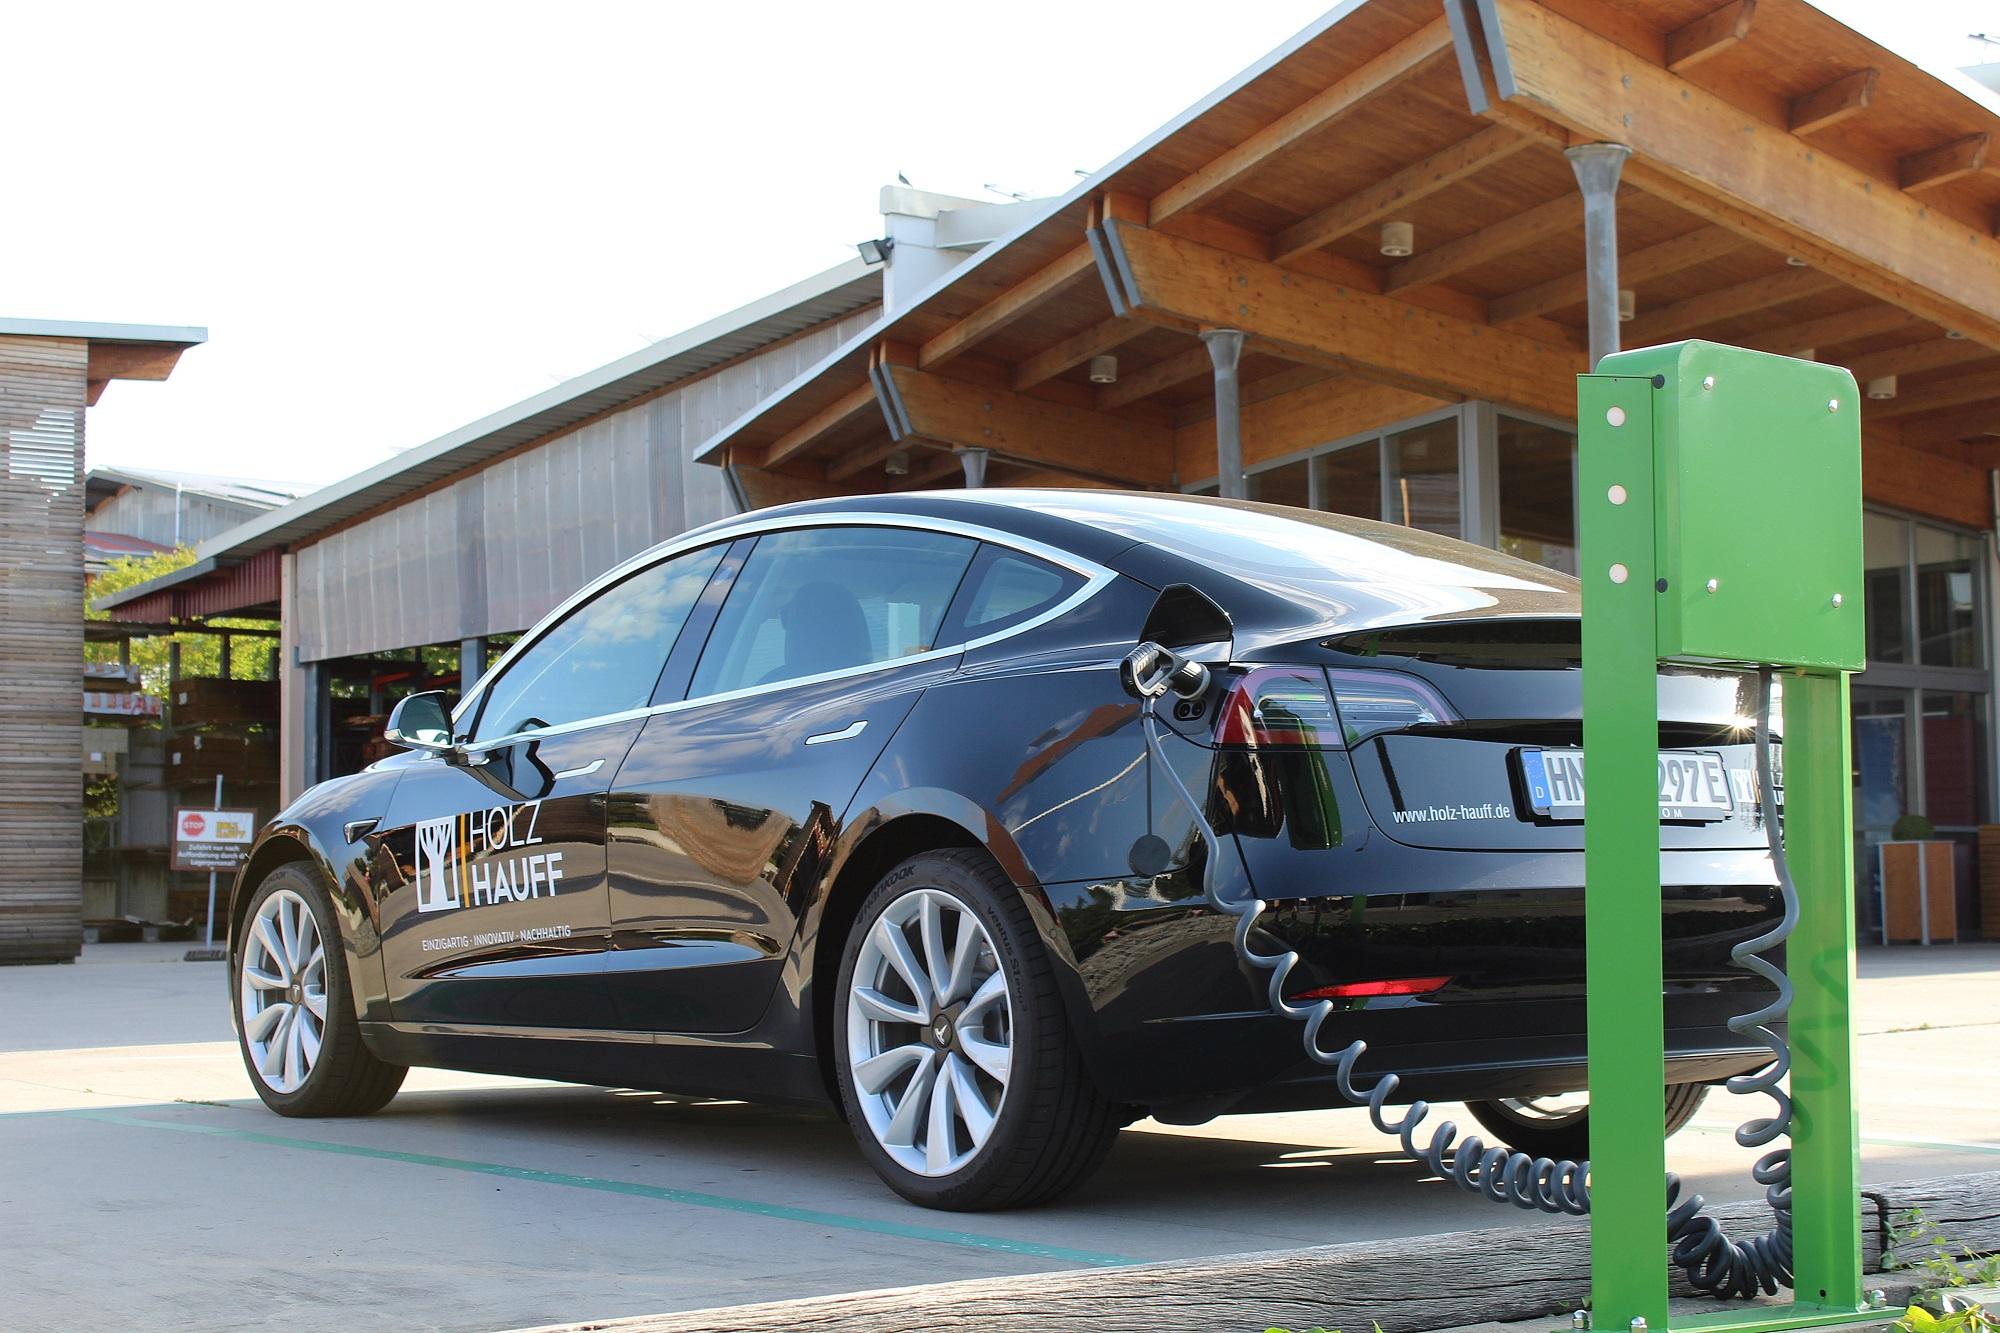 Tesla Elektrofahrzeug tankt an Elektrotankstelle bei Holz-Hauff GmbH in Leingarten